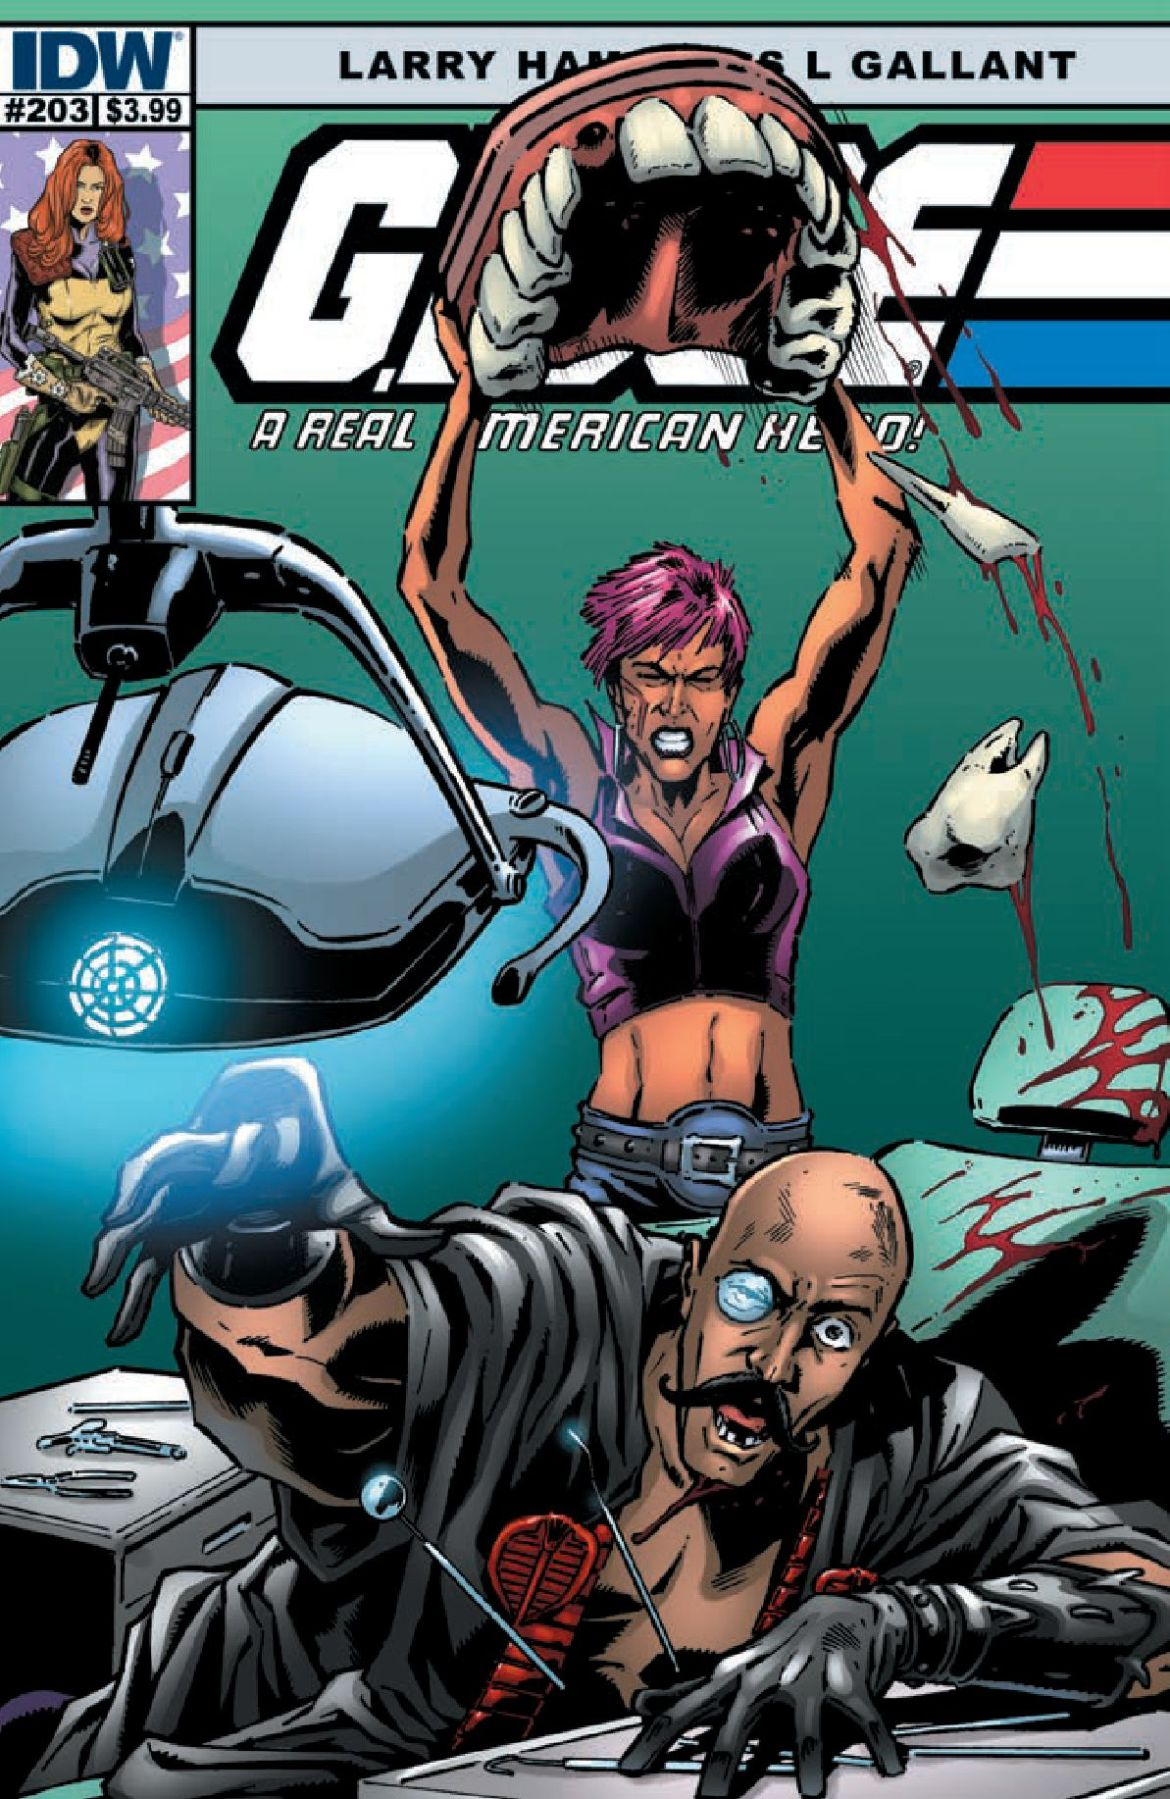 G.I. Joe: A Real American Hero #203 Preview